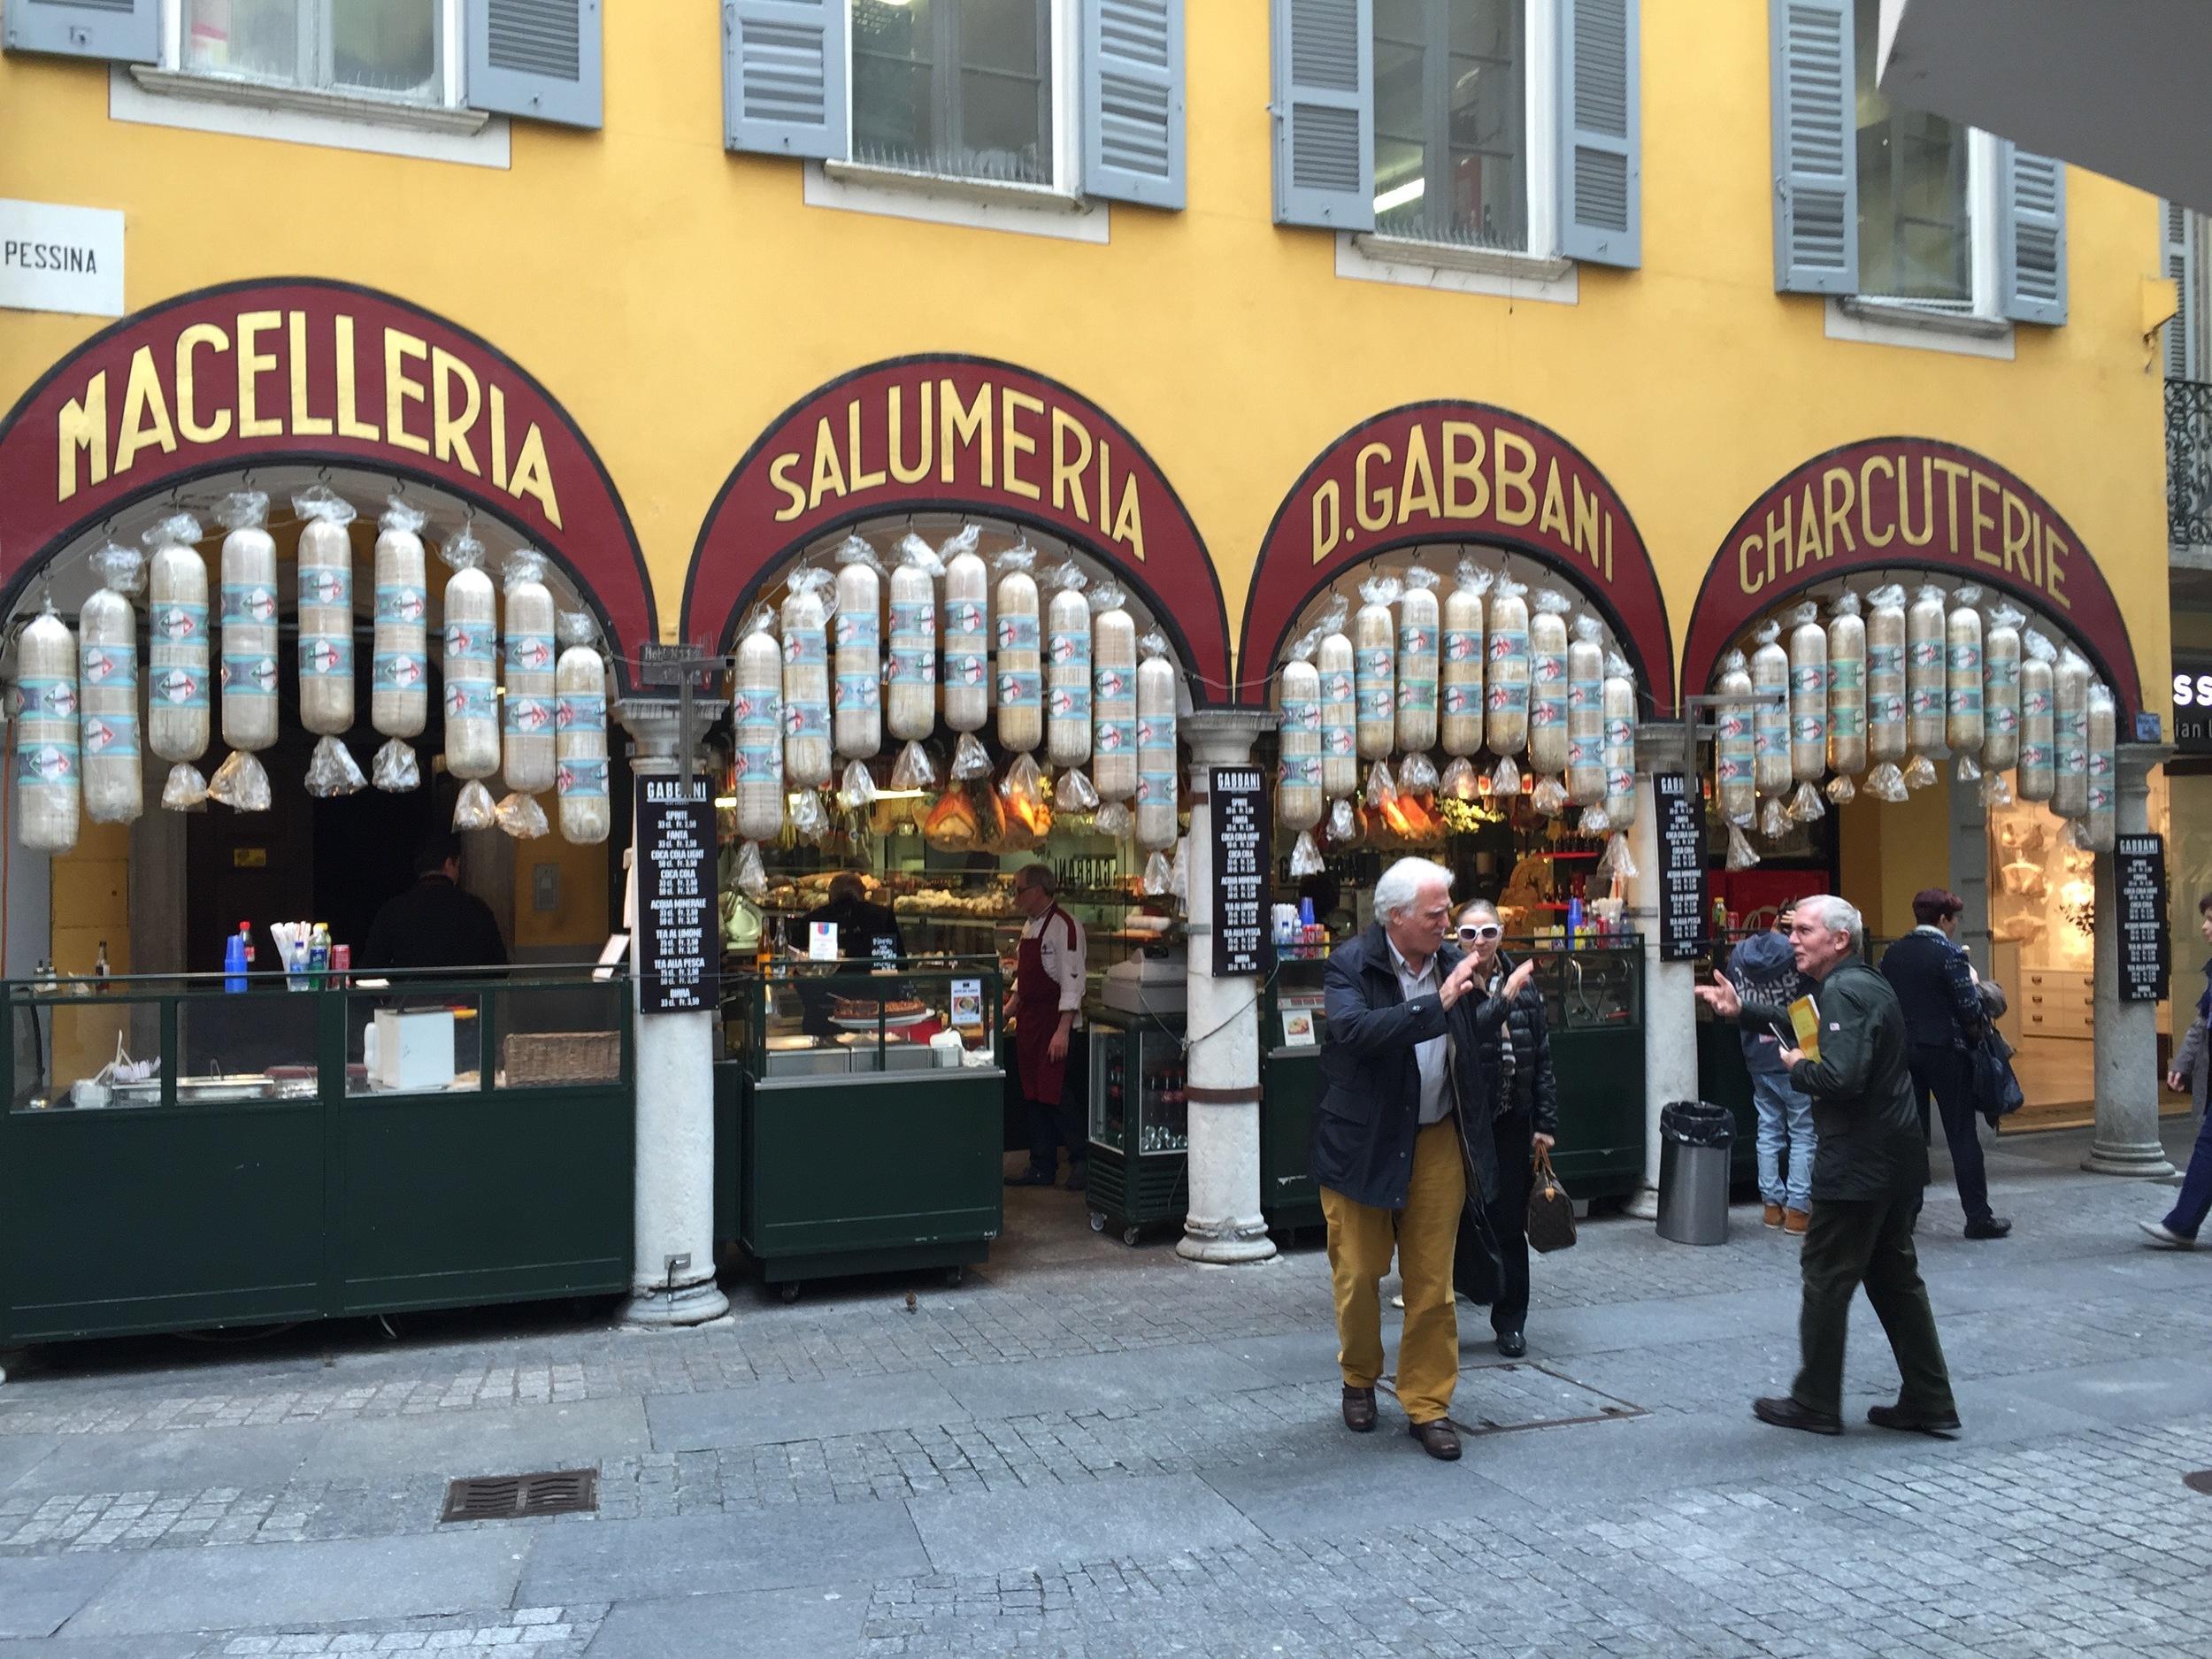 Gabbani market